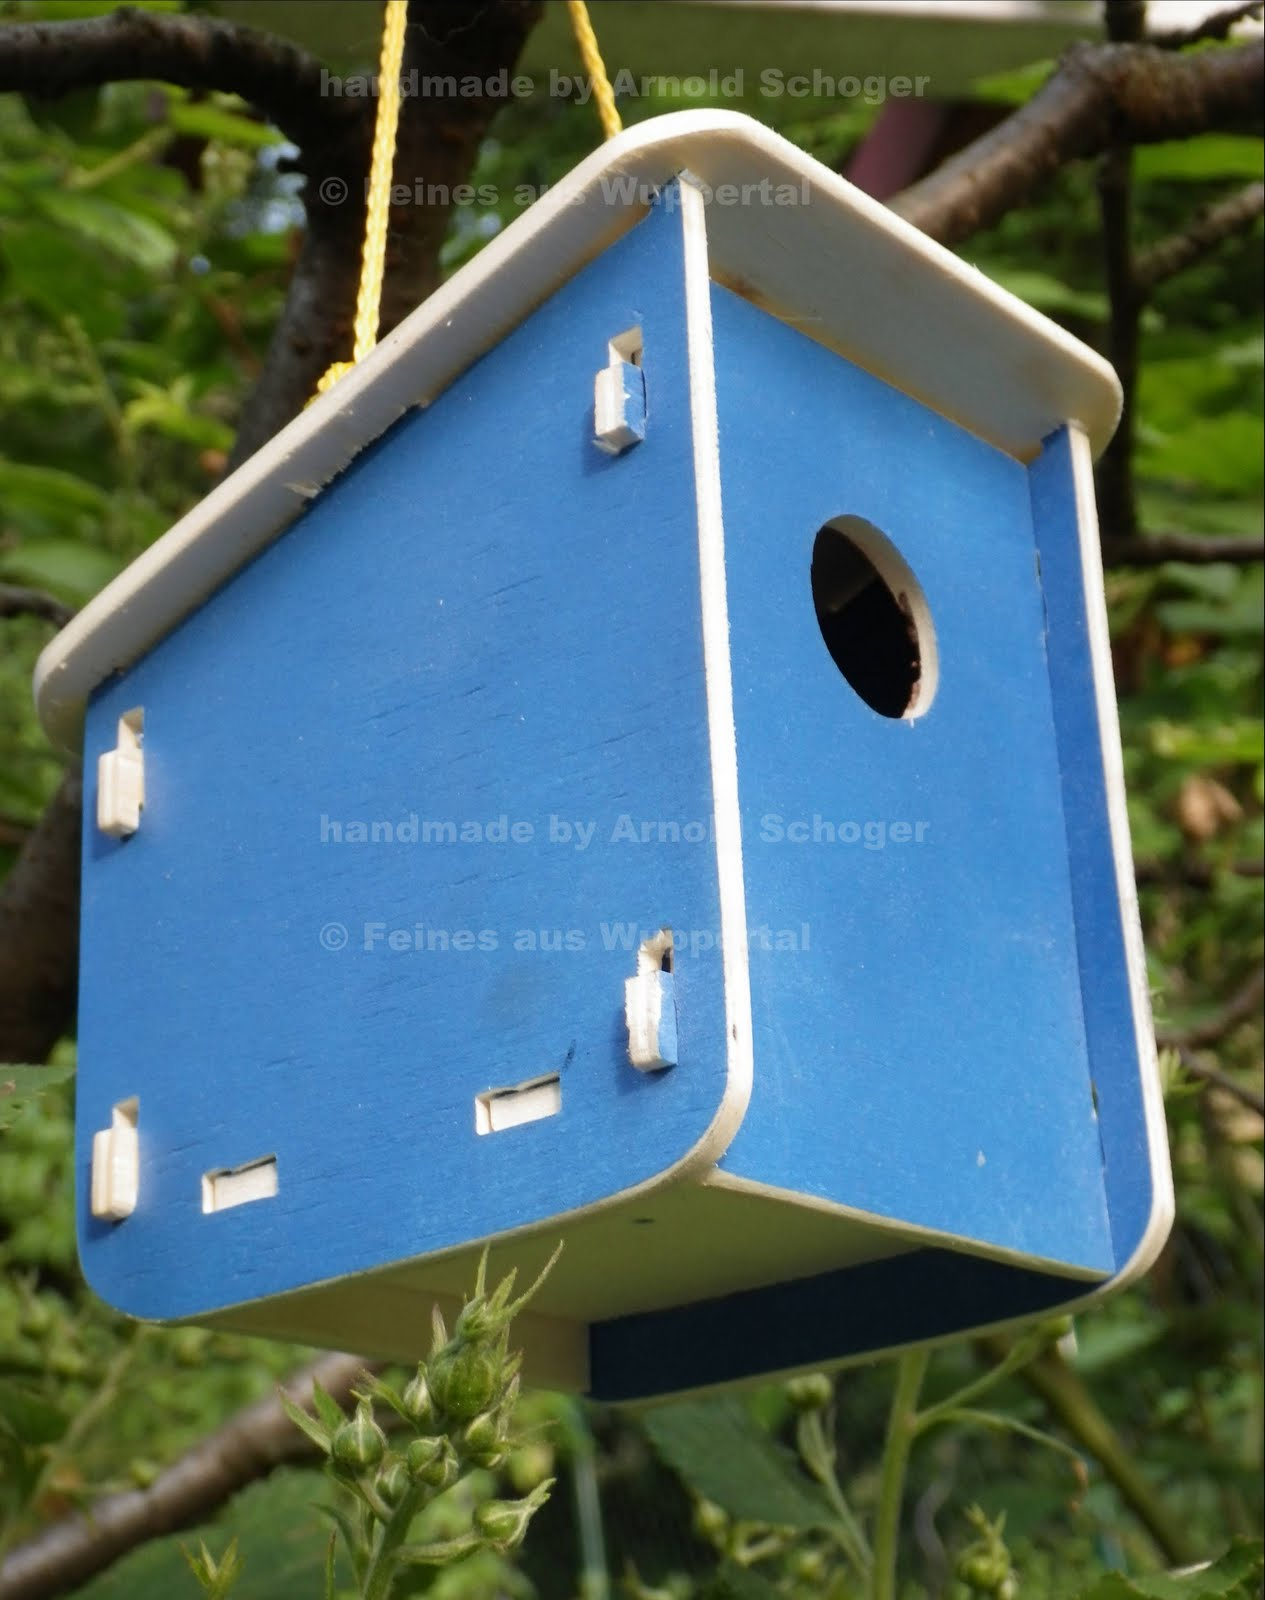 winziges vogelhaus als holzwerkstattprojekt an schulen feines aus wuppertal. Black Bedroom Furniture Sets. Home Design Ideas